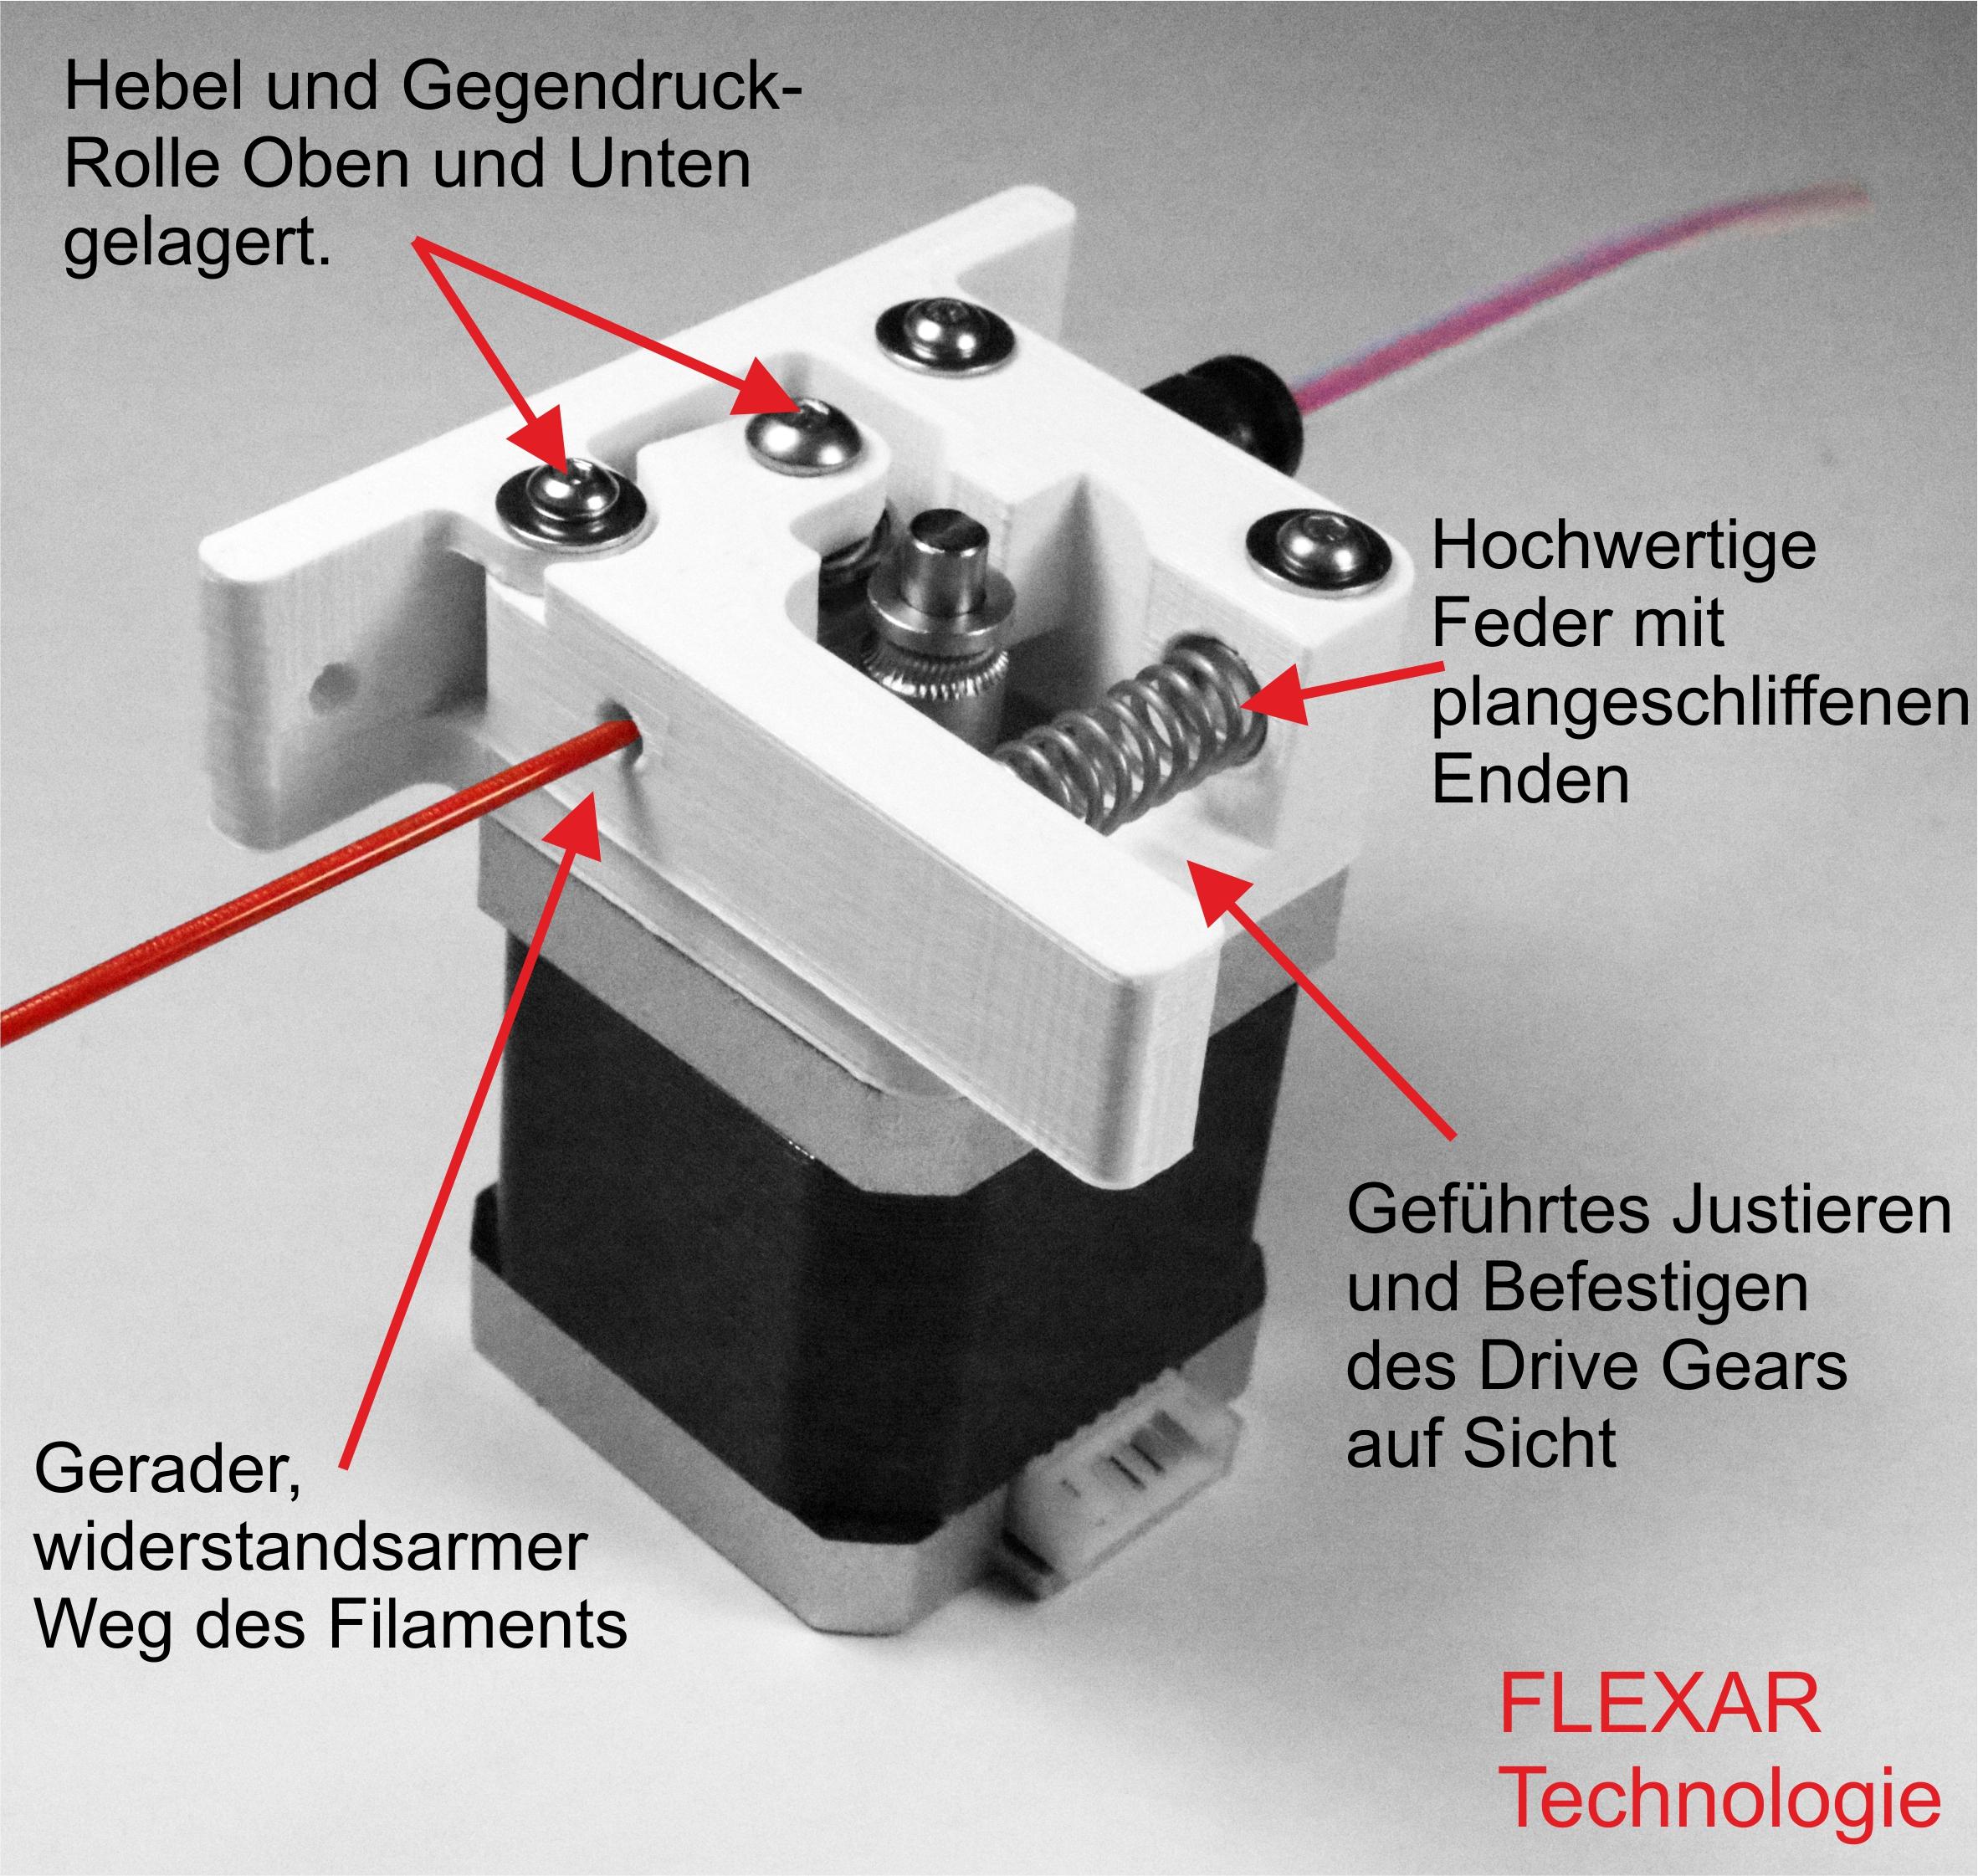 simple-flexar-extruder-eigenschaften-beschrieben-115rTjXMvpOtf0